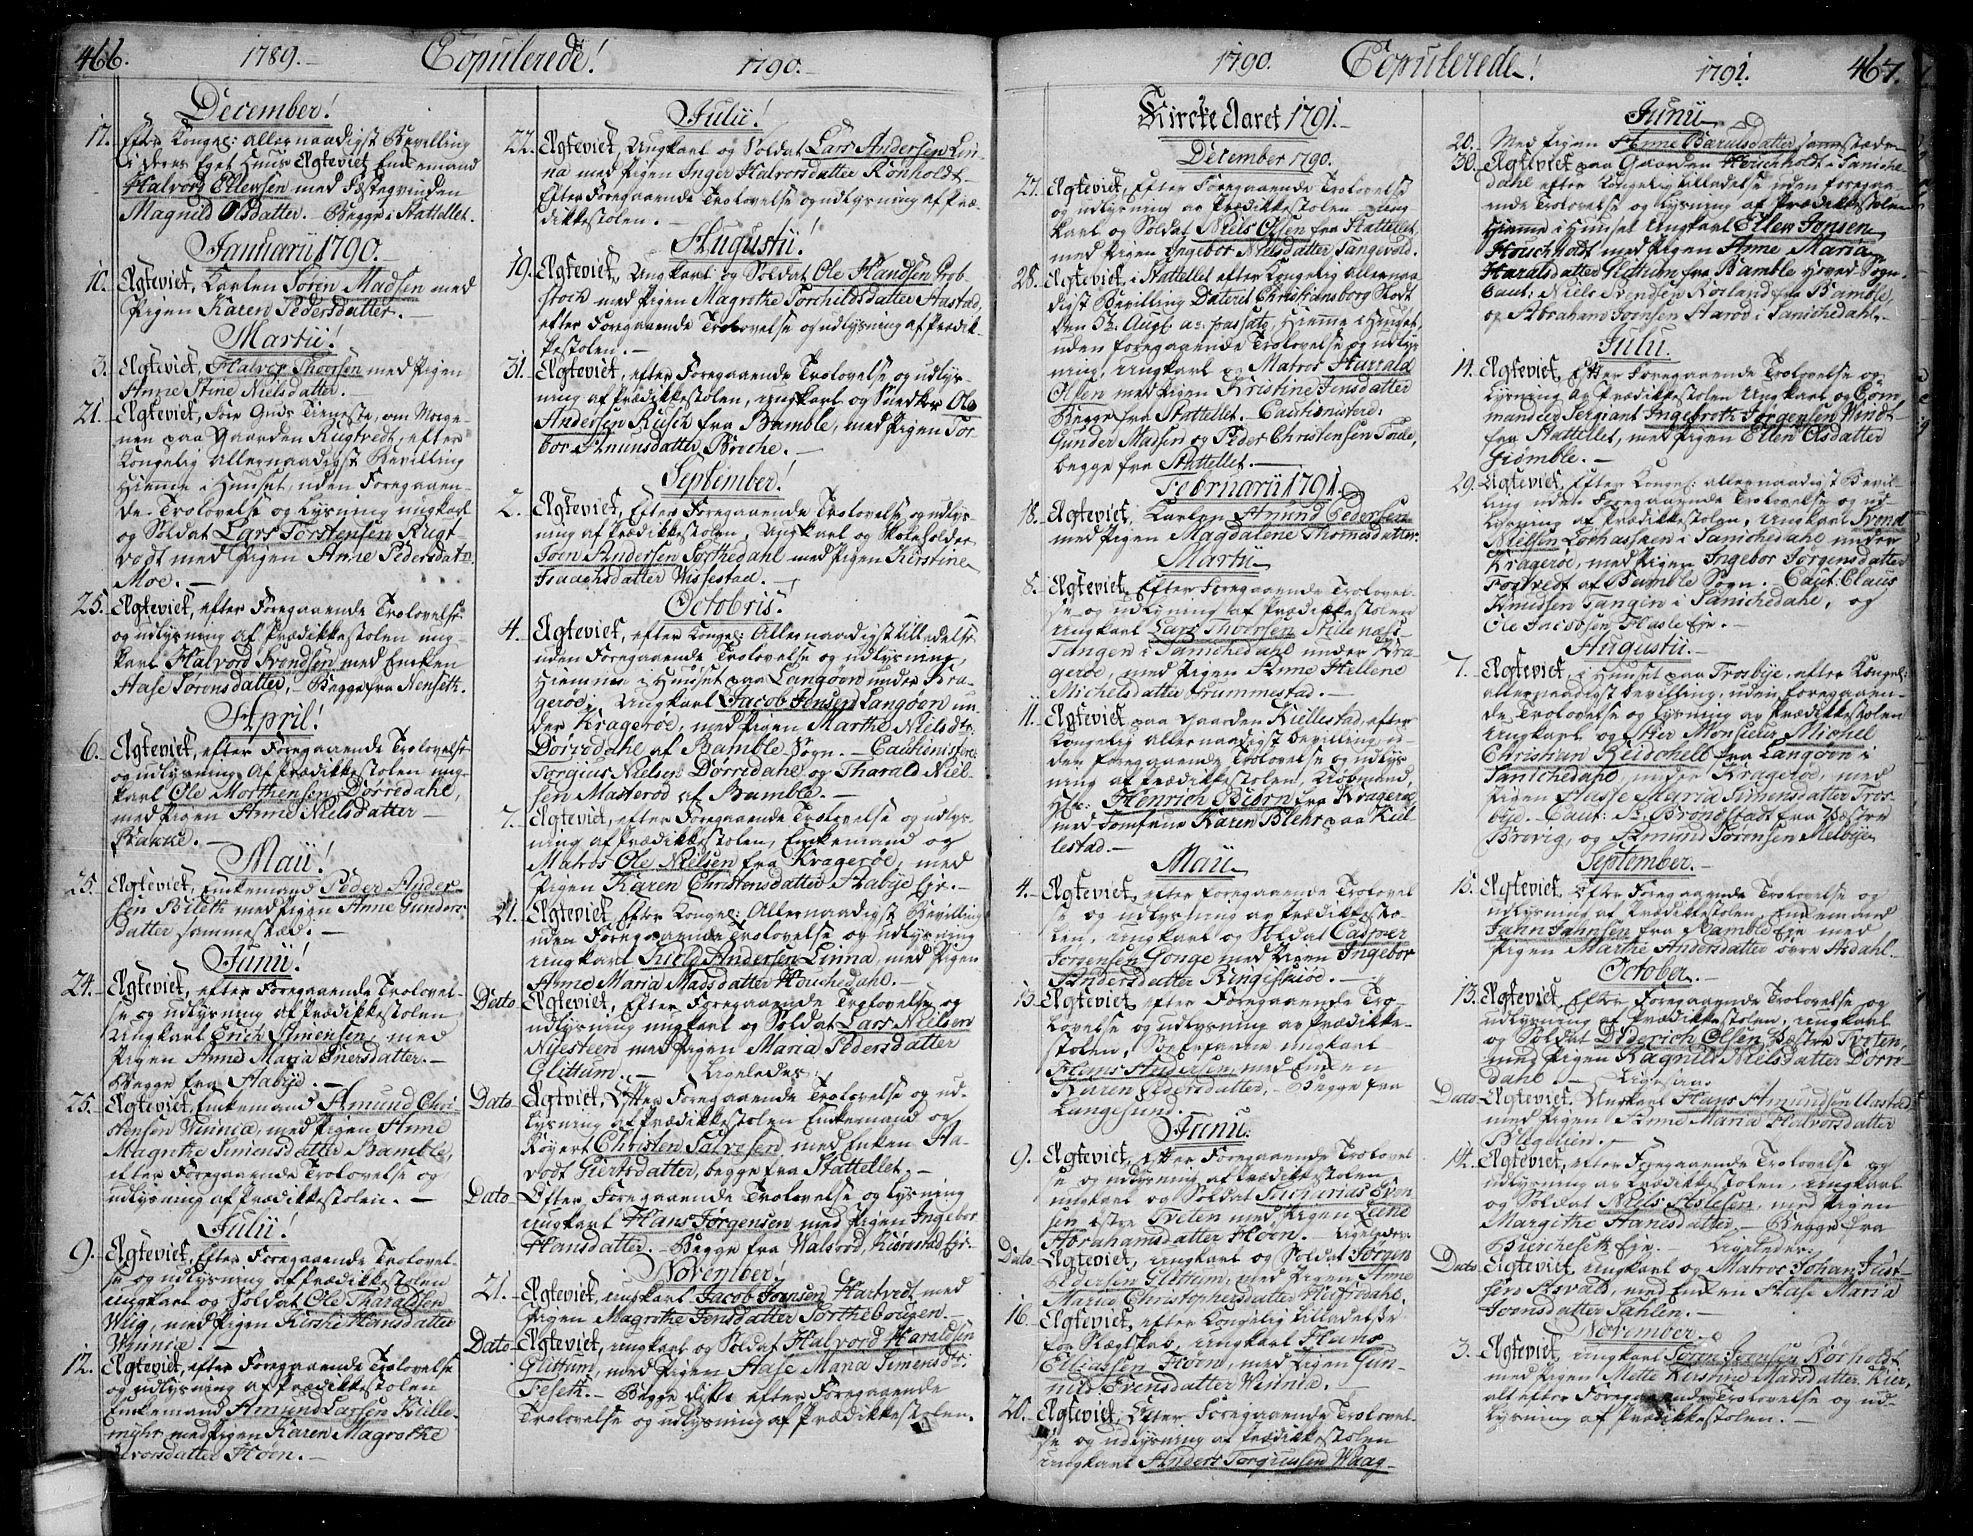 SAKO, Bamble kirkebøker, F/Fa/L0002: Ministerialbok nr. I 2, 1775-1814, s. 466-467